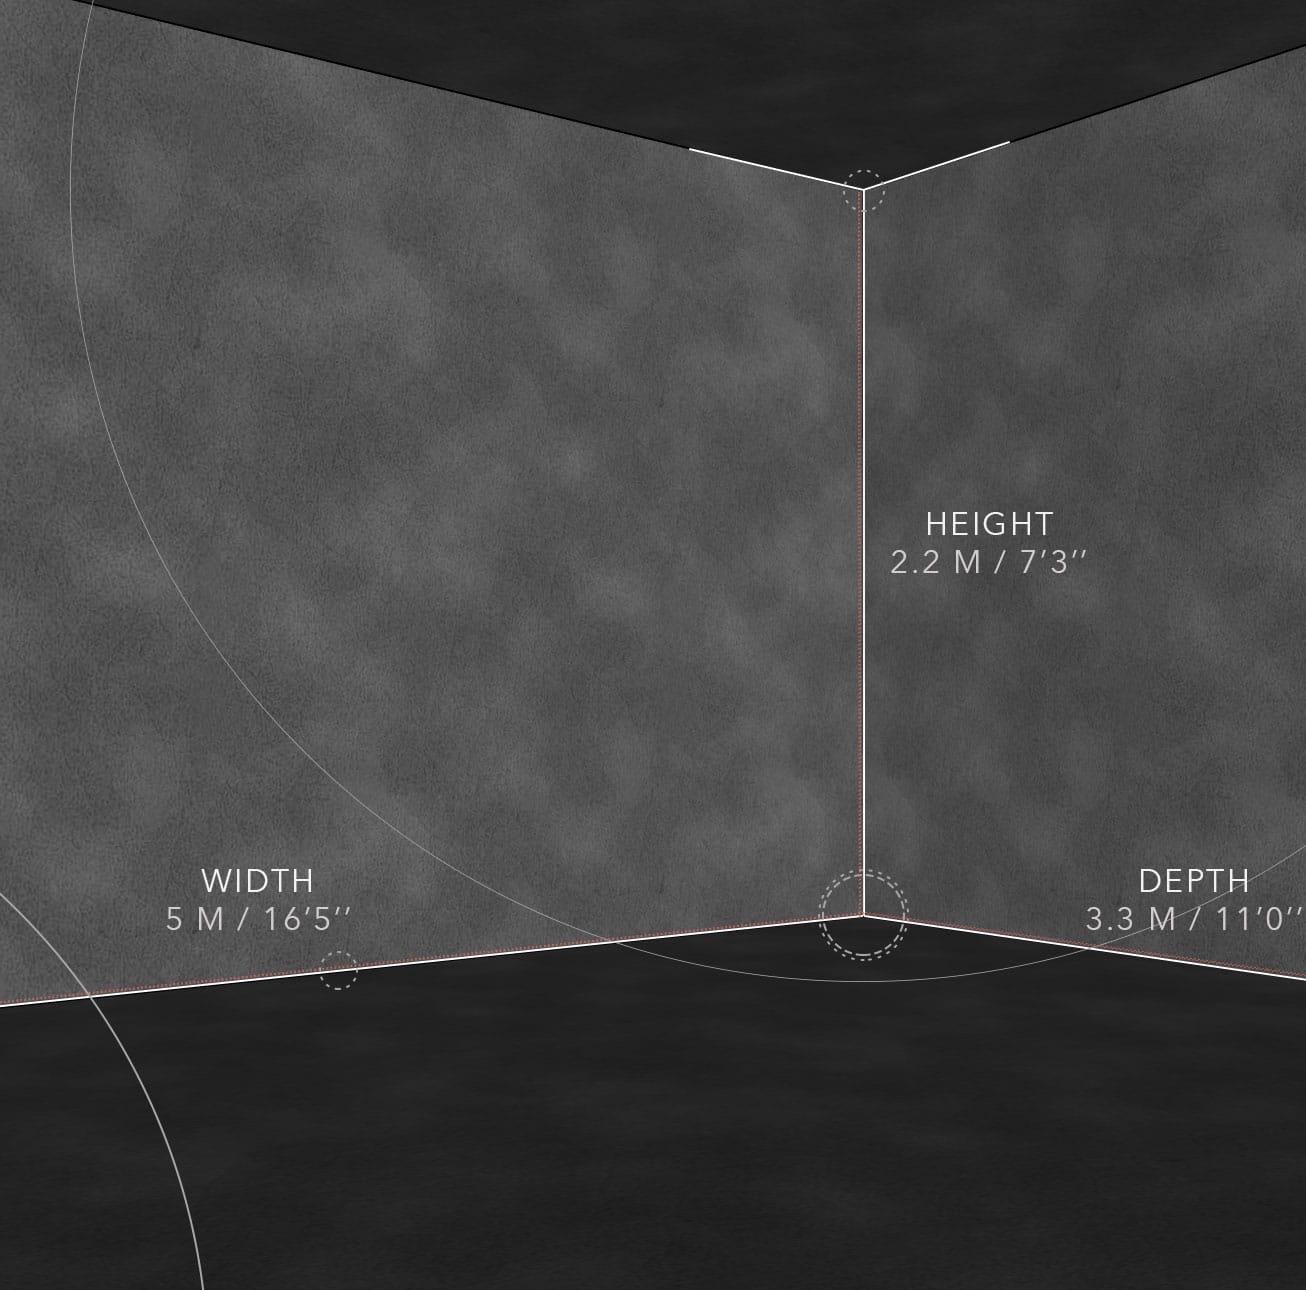 Shooting Simulator ST-2 Dimensions-PREMIUM